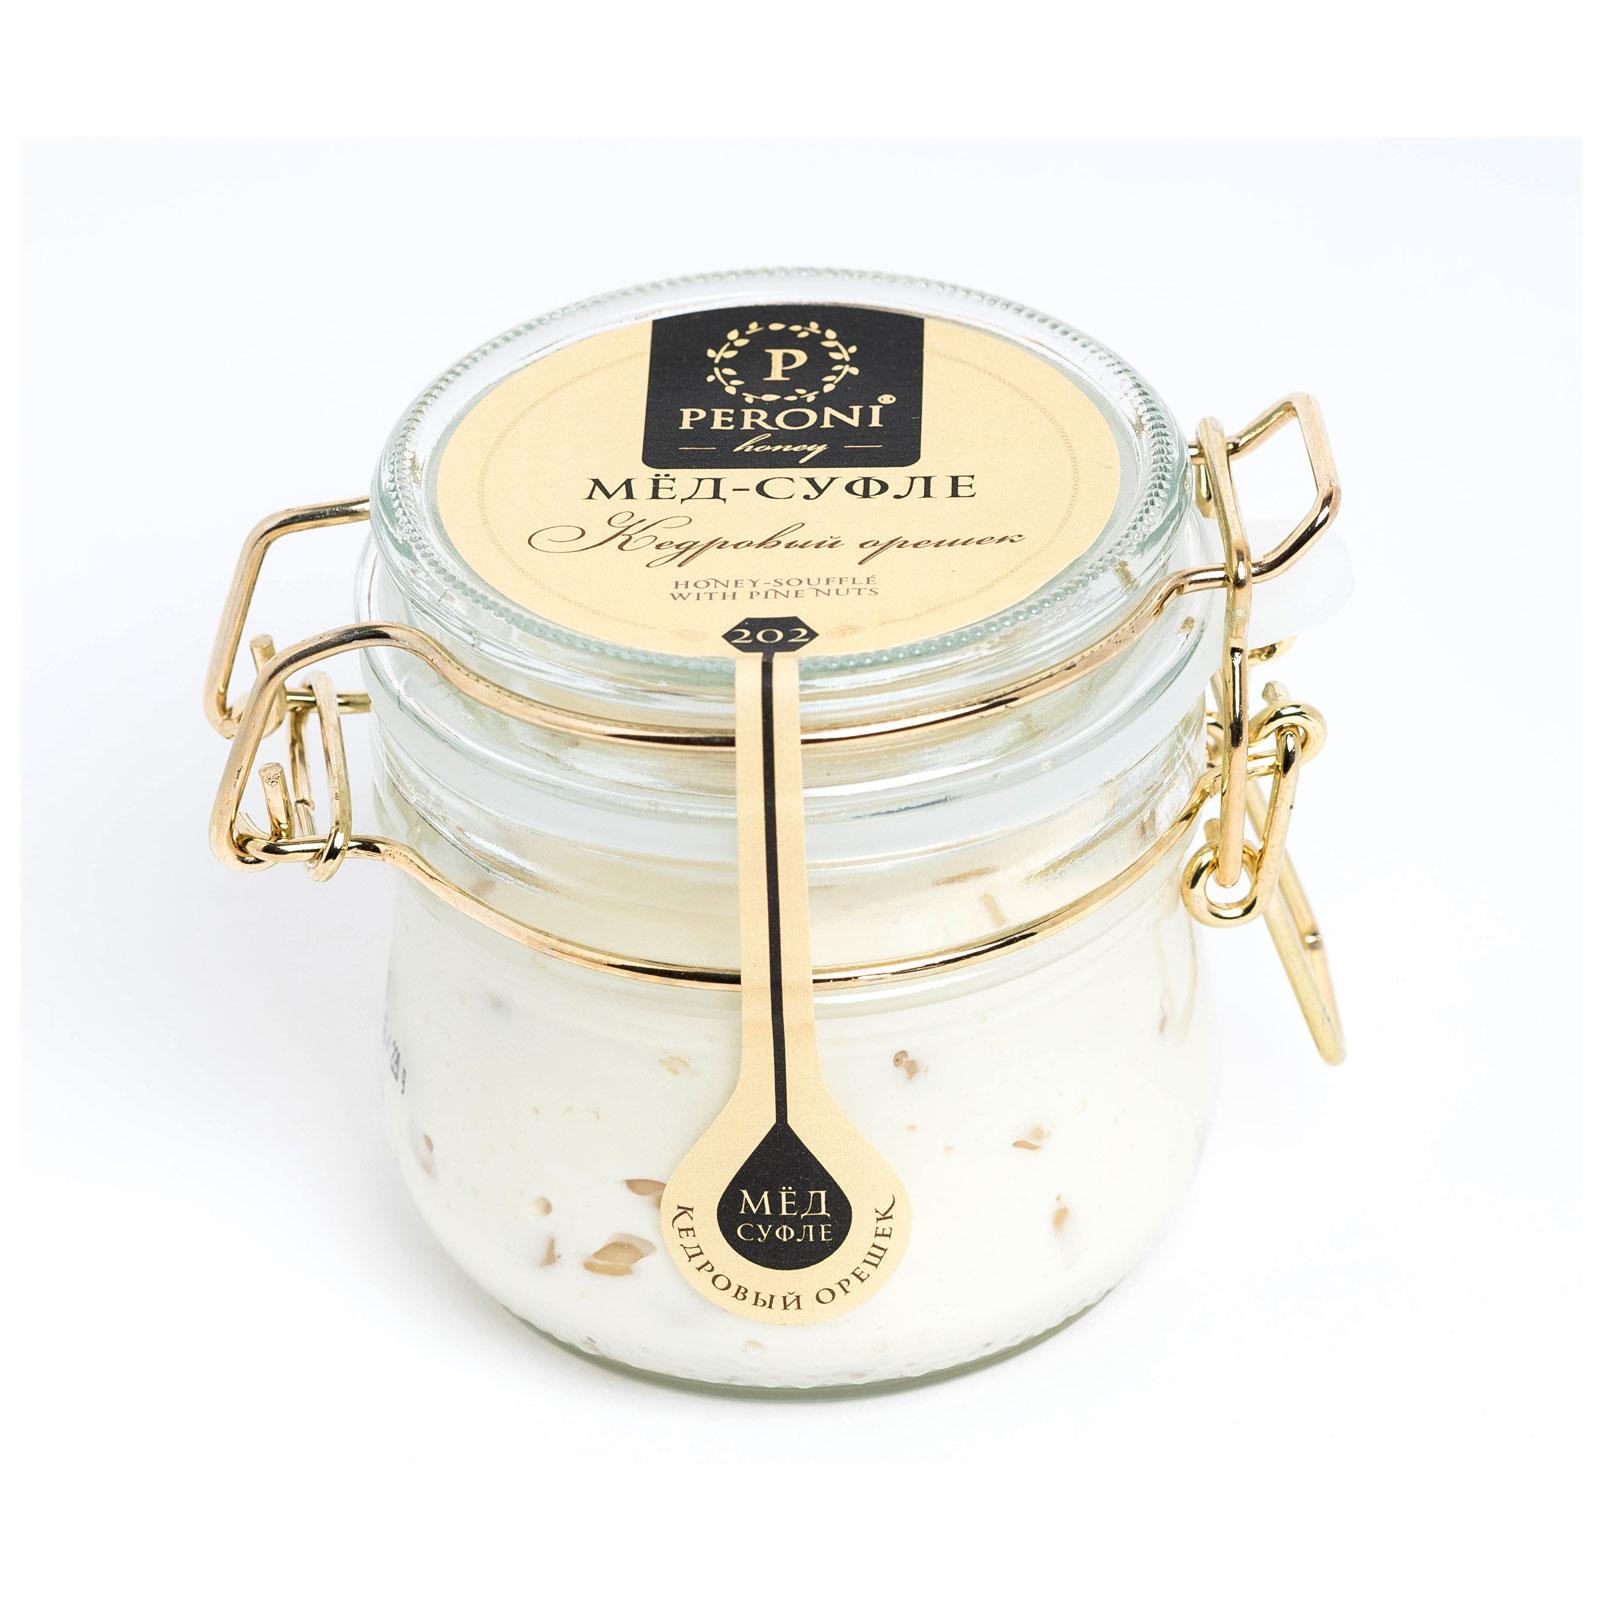 Мёд-суфле Peroni Honey 250 мл Кедровый орешек<br>